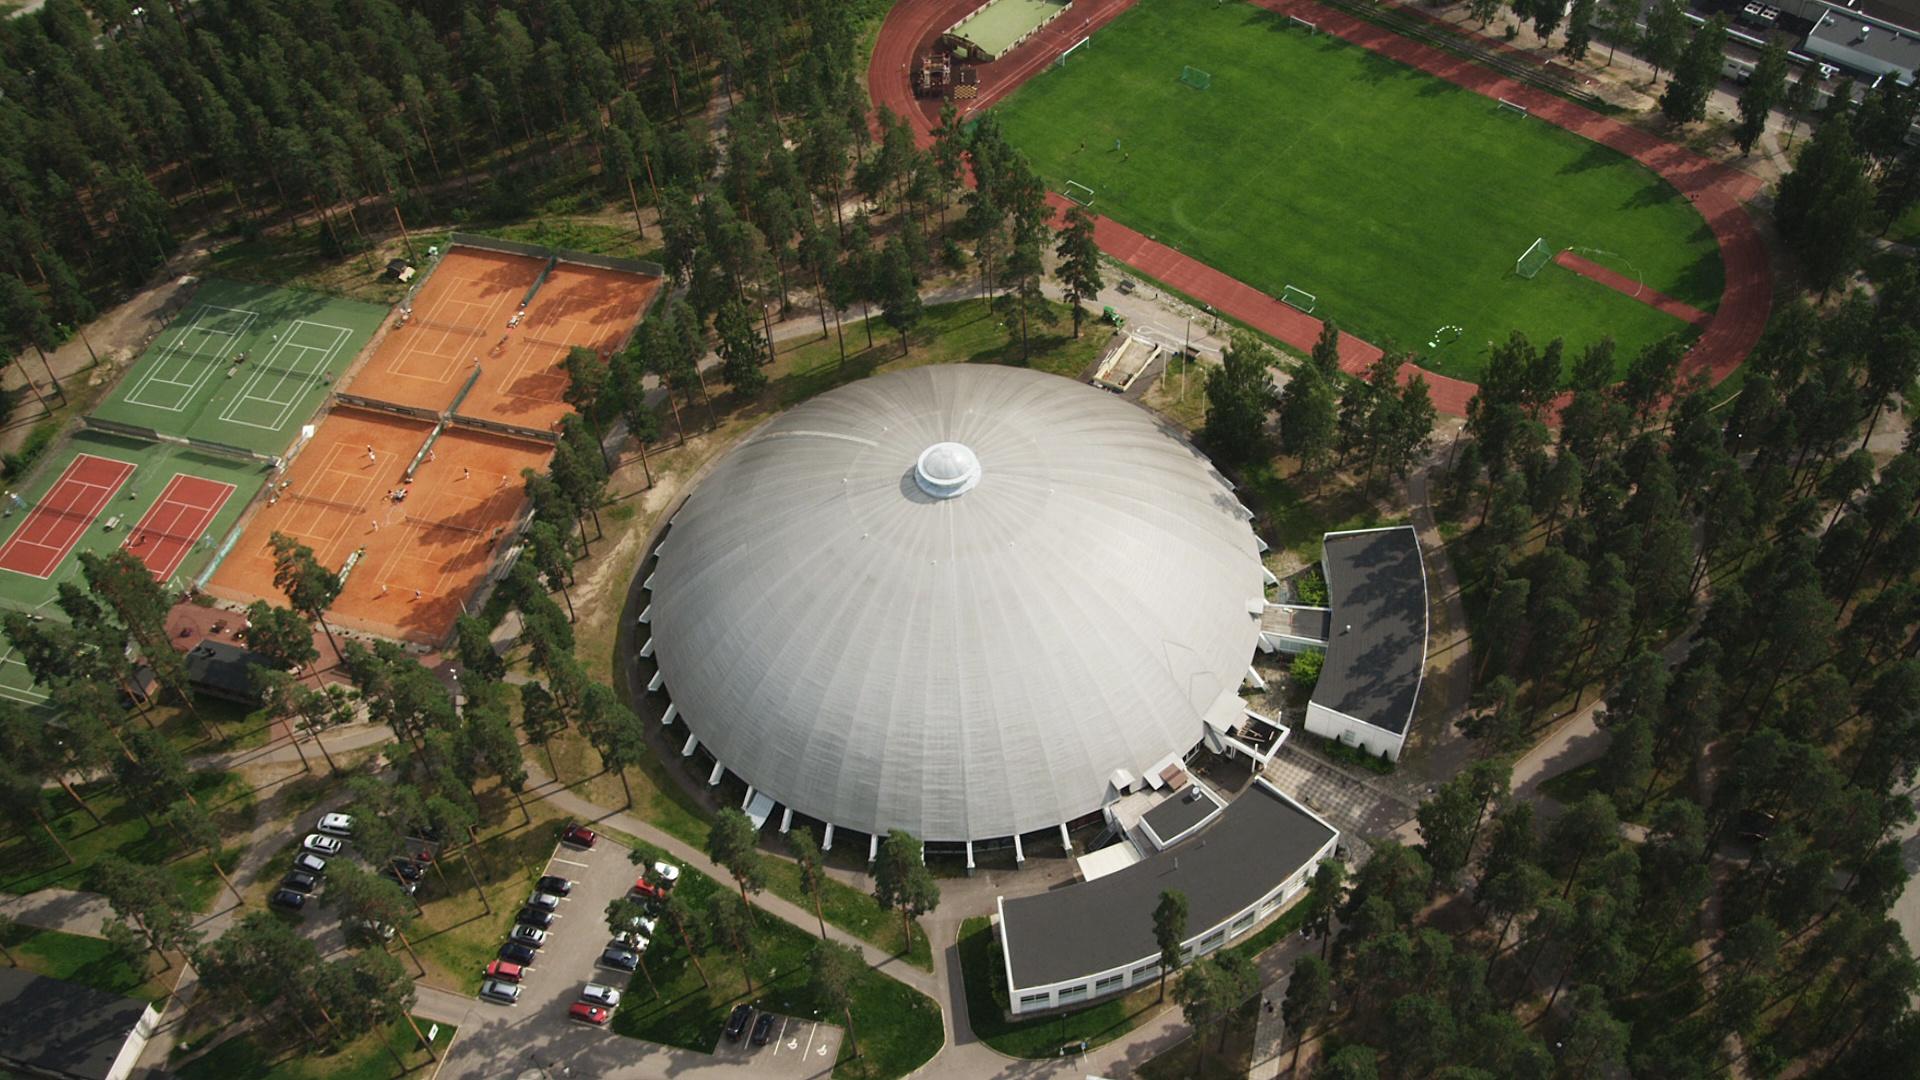 Vierumäki Olympic Training Center